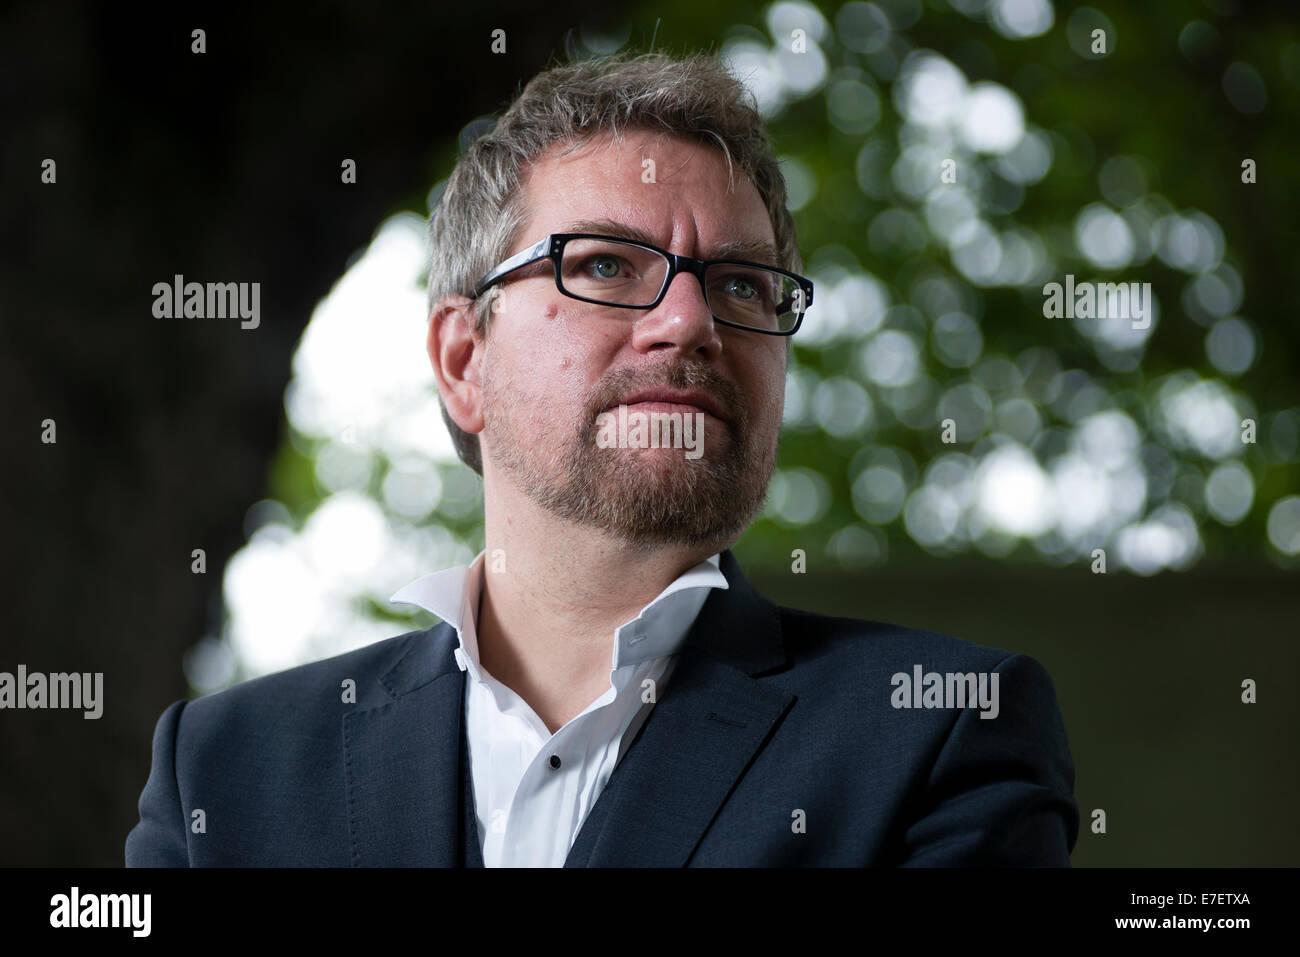 Photographer Martin Gray appears at the Edinburgh International Book Festival. - Stock Image